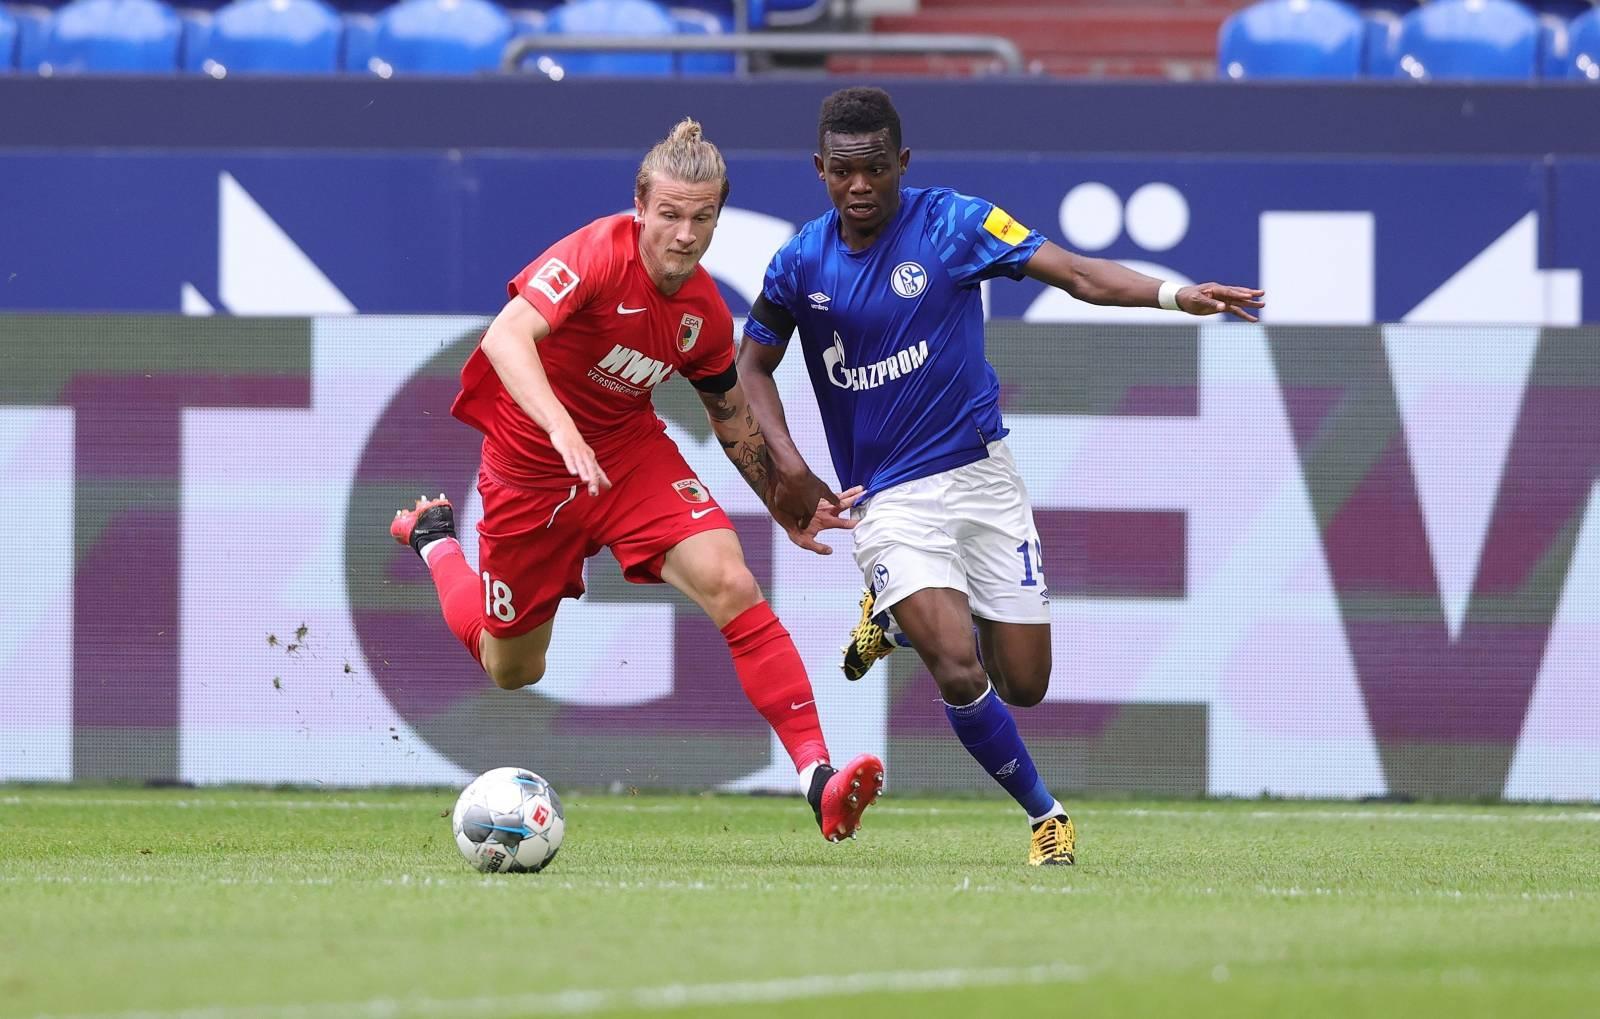 firo, football: 24.05.2020 1.Bundesliga, season 19/20 2019/2020 27th matchday: FC Schalke 04 - FC Augsburg